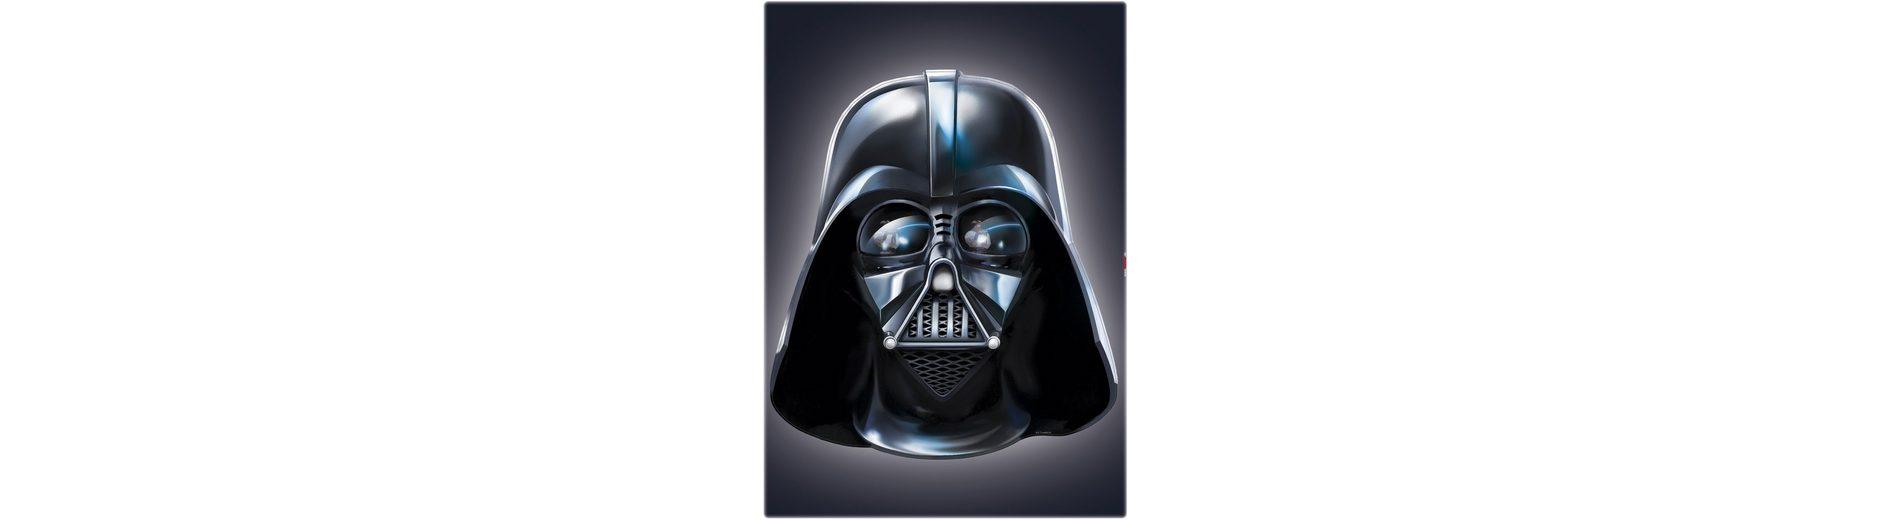 Wandsticker, Komar, »Star Wars Darth Vader«, 50/70 cm